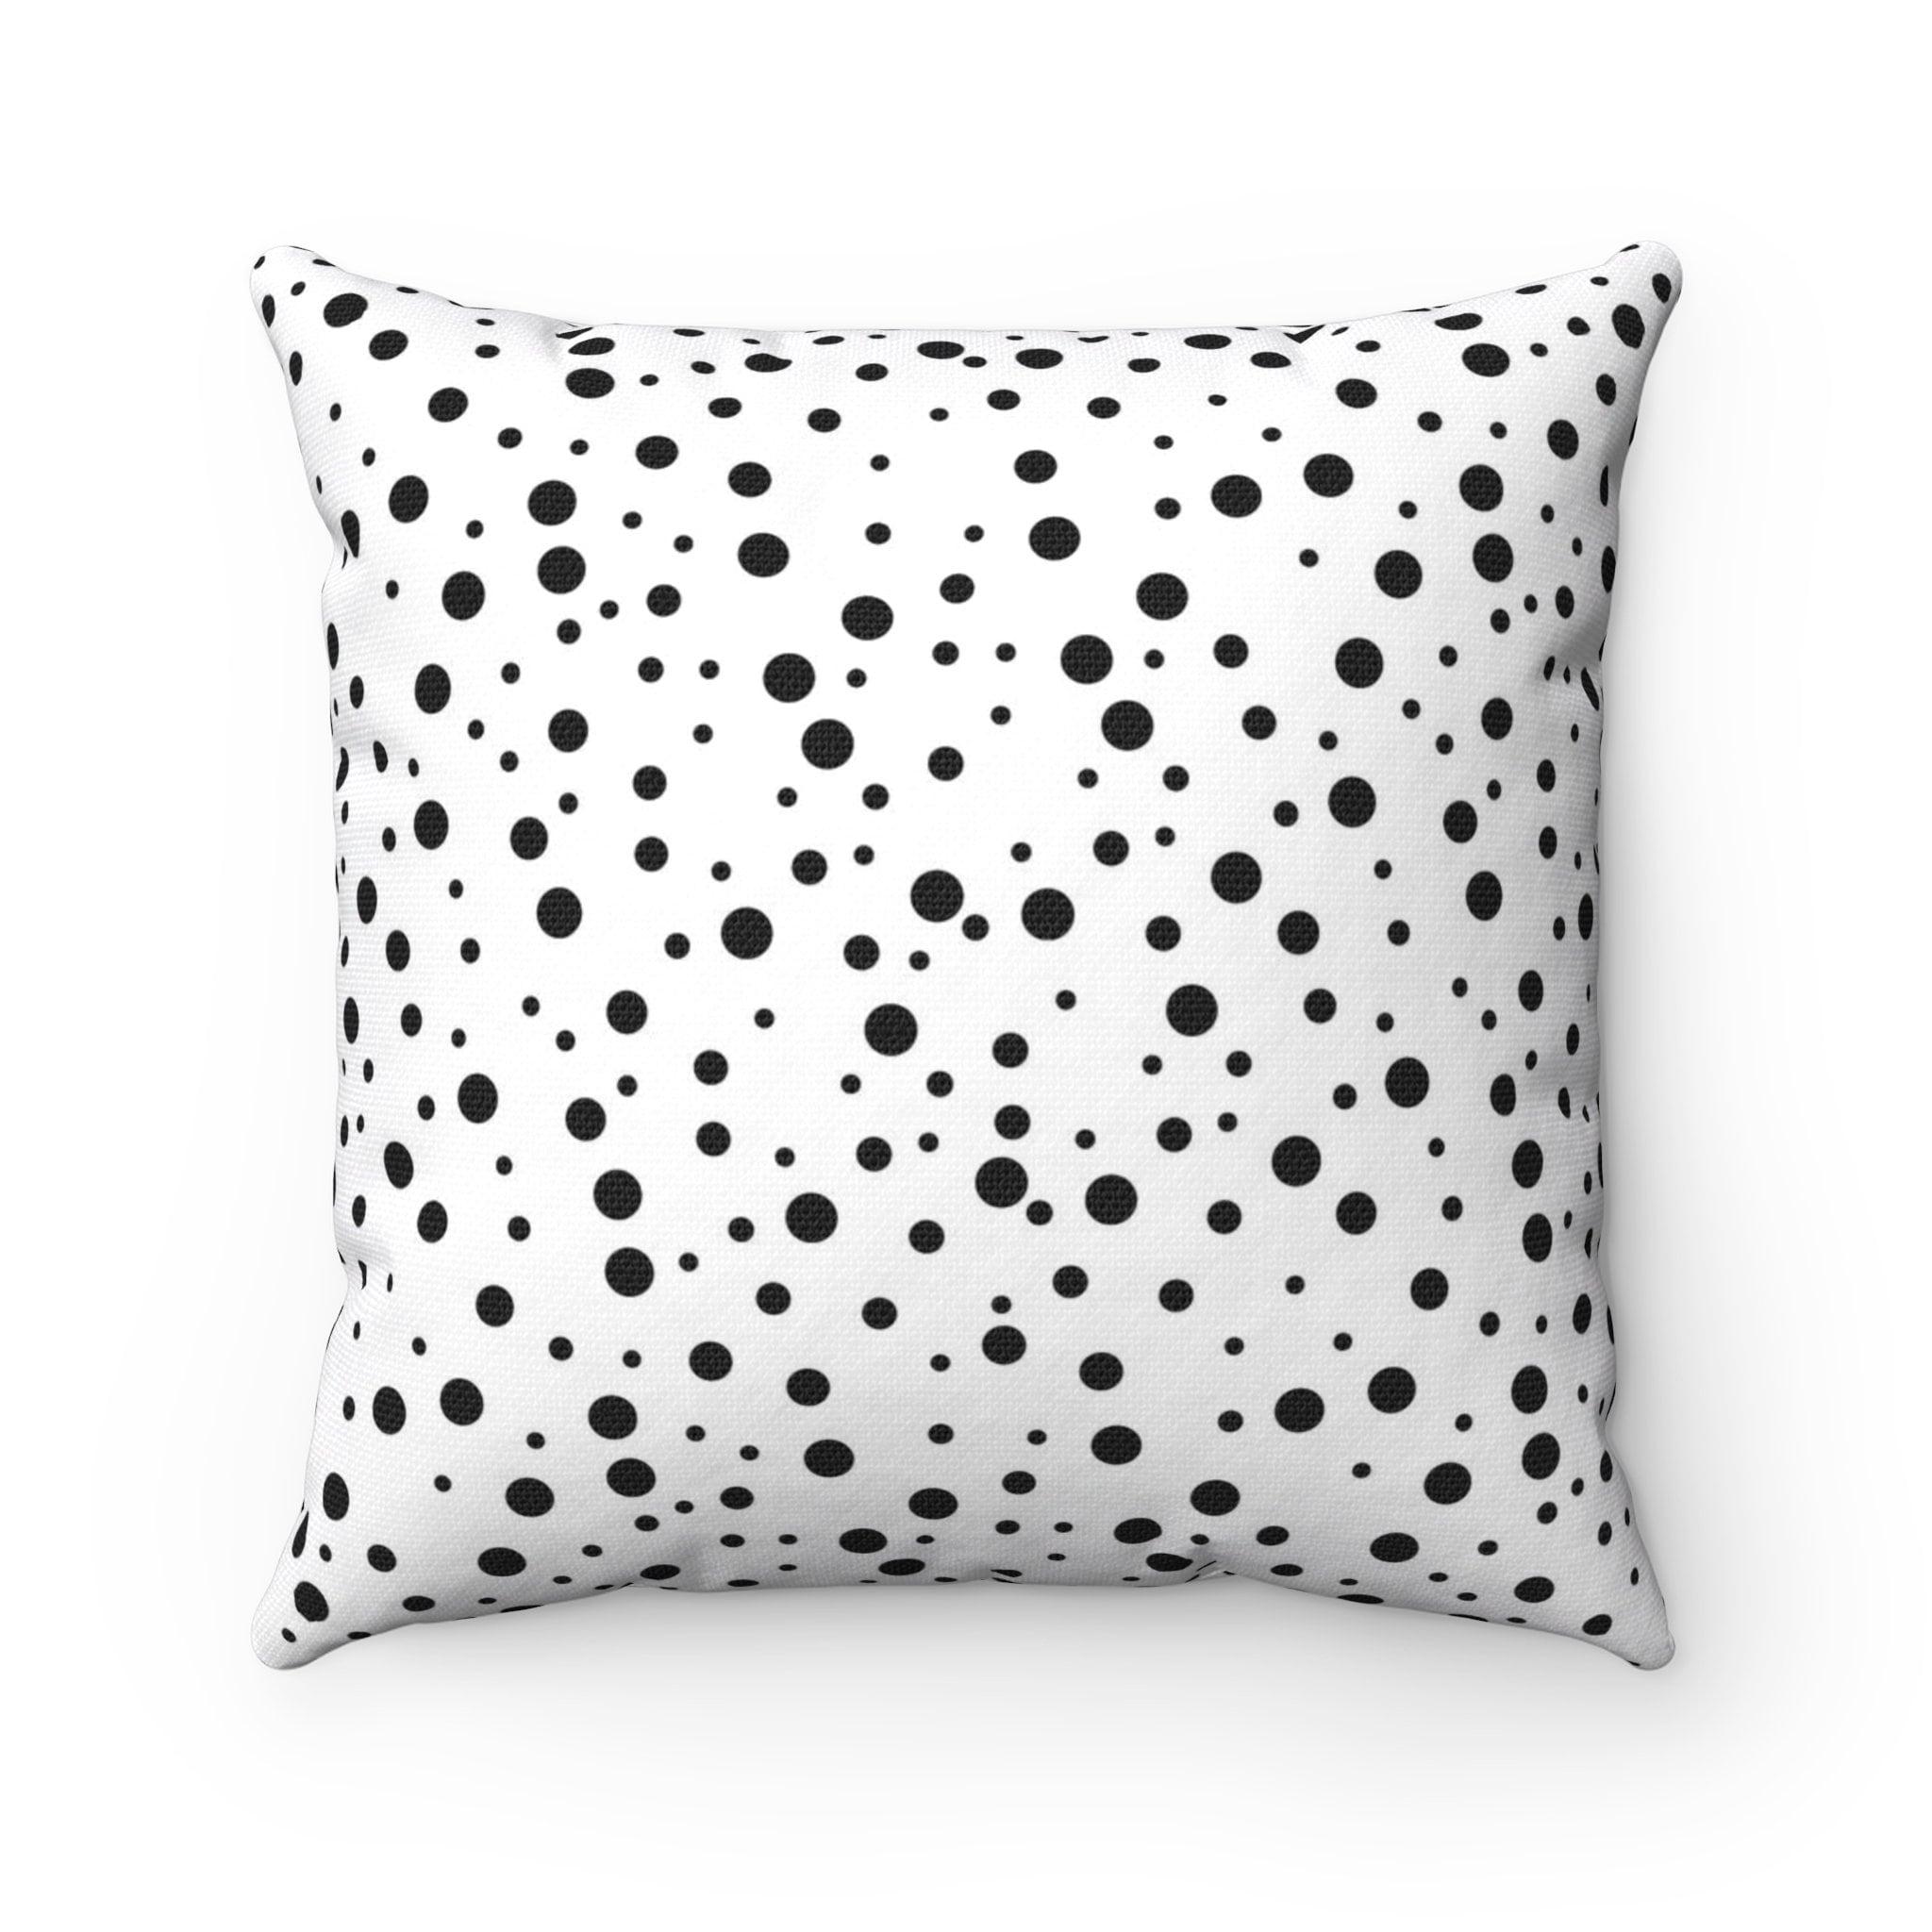 Dots Decorative Pillow Black White Pillow Throw Pillow Cover Modern Pillow 16x16 Pillow Cover Black And White Pillow Dots Pillow